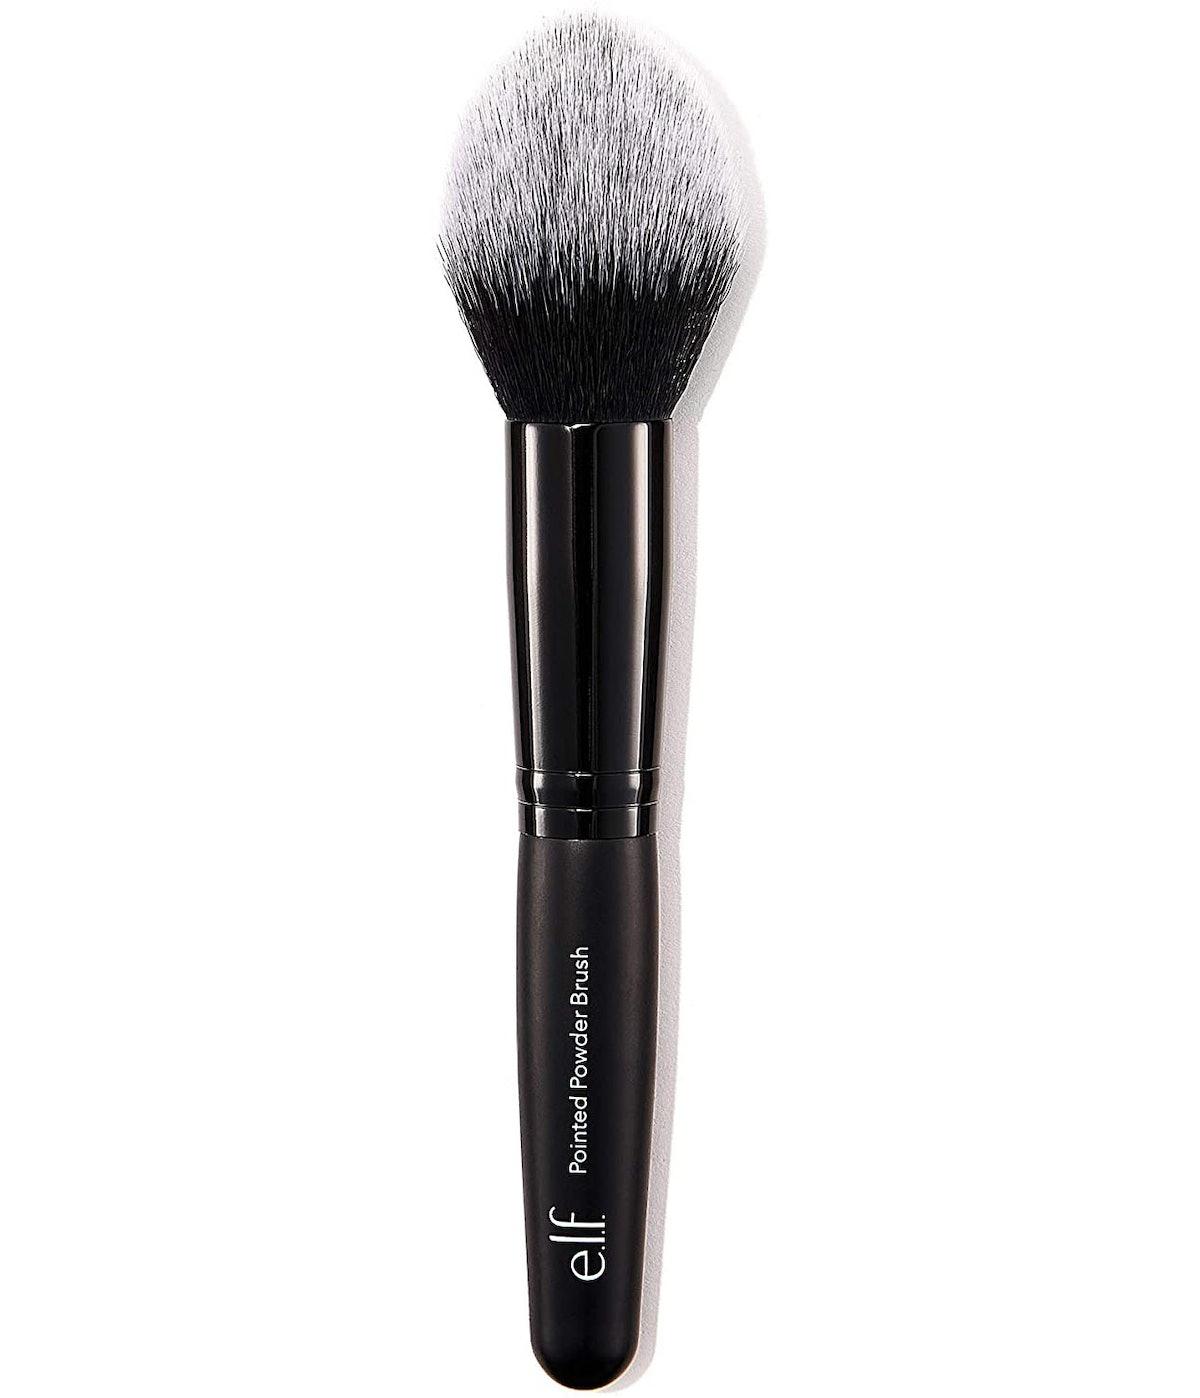 e.l.f. Pointed Powder Brush